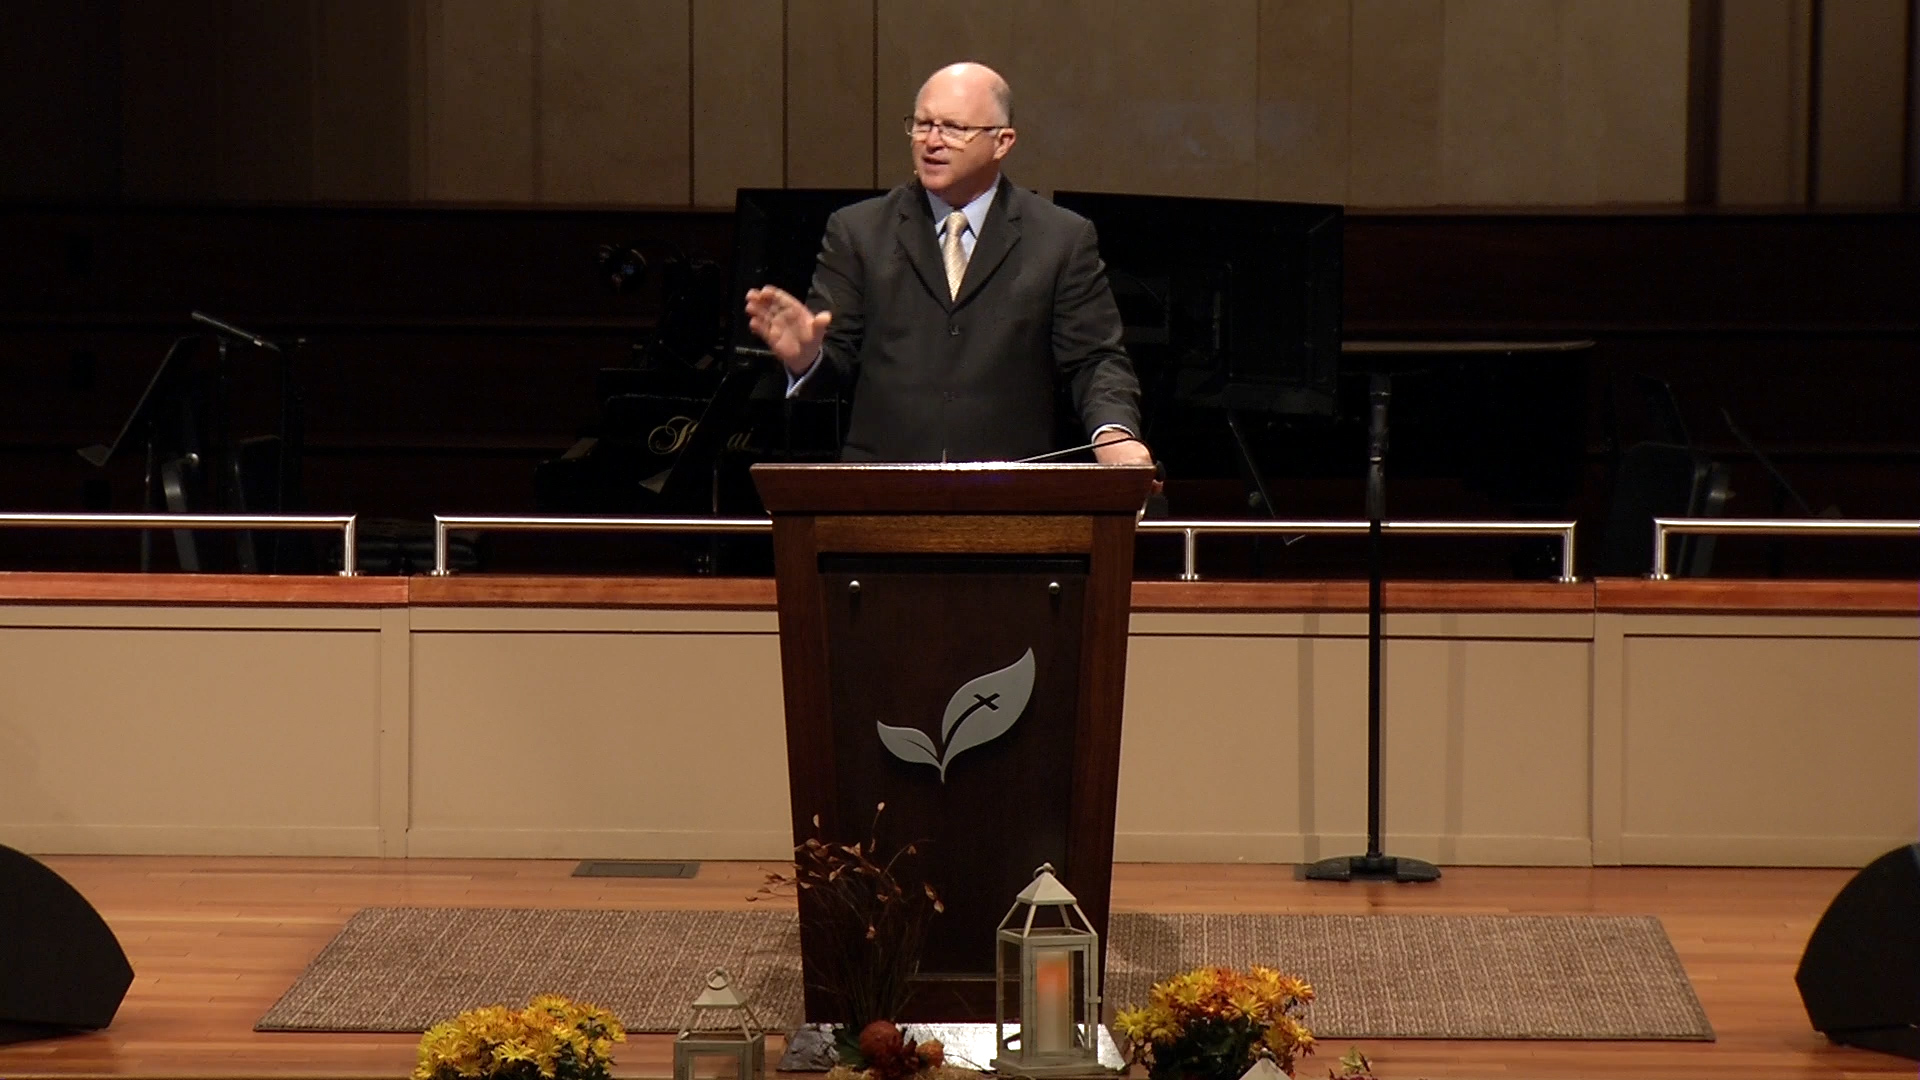 Pastor Paul Chappell: Teaching Eternal Truths